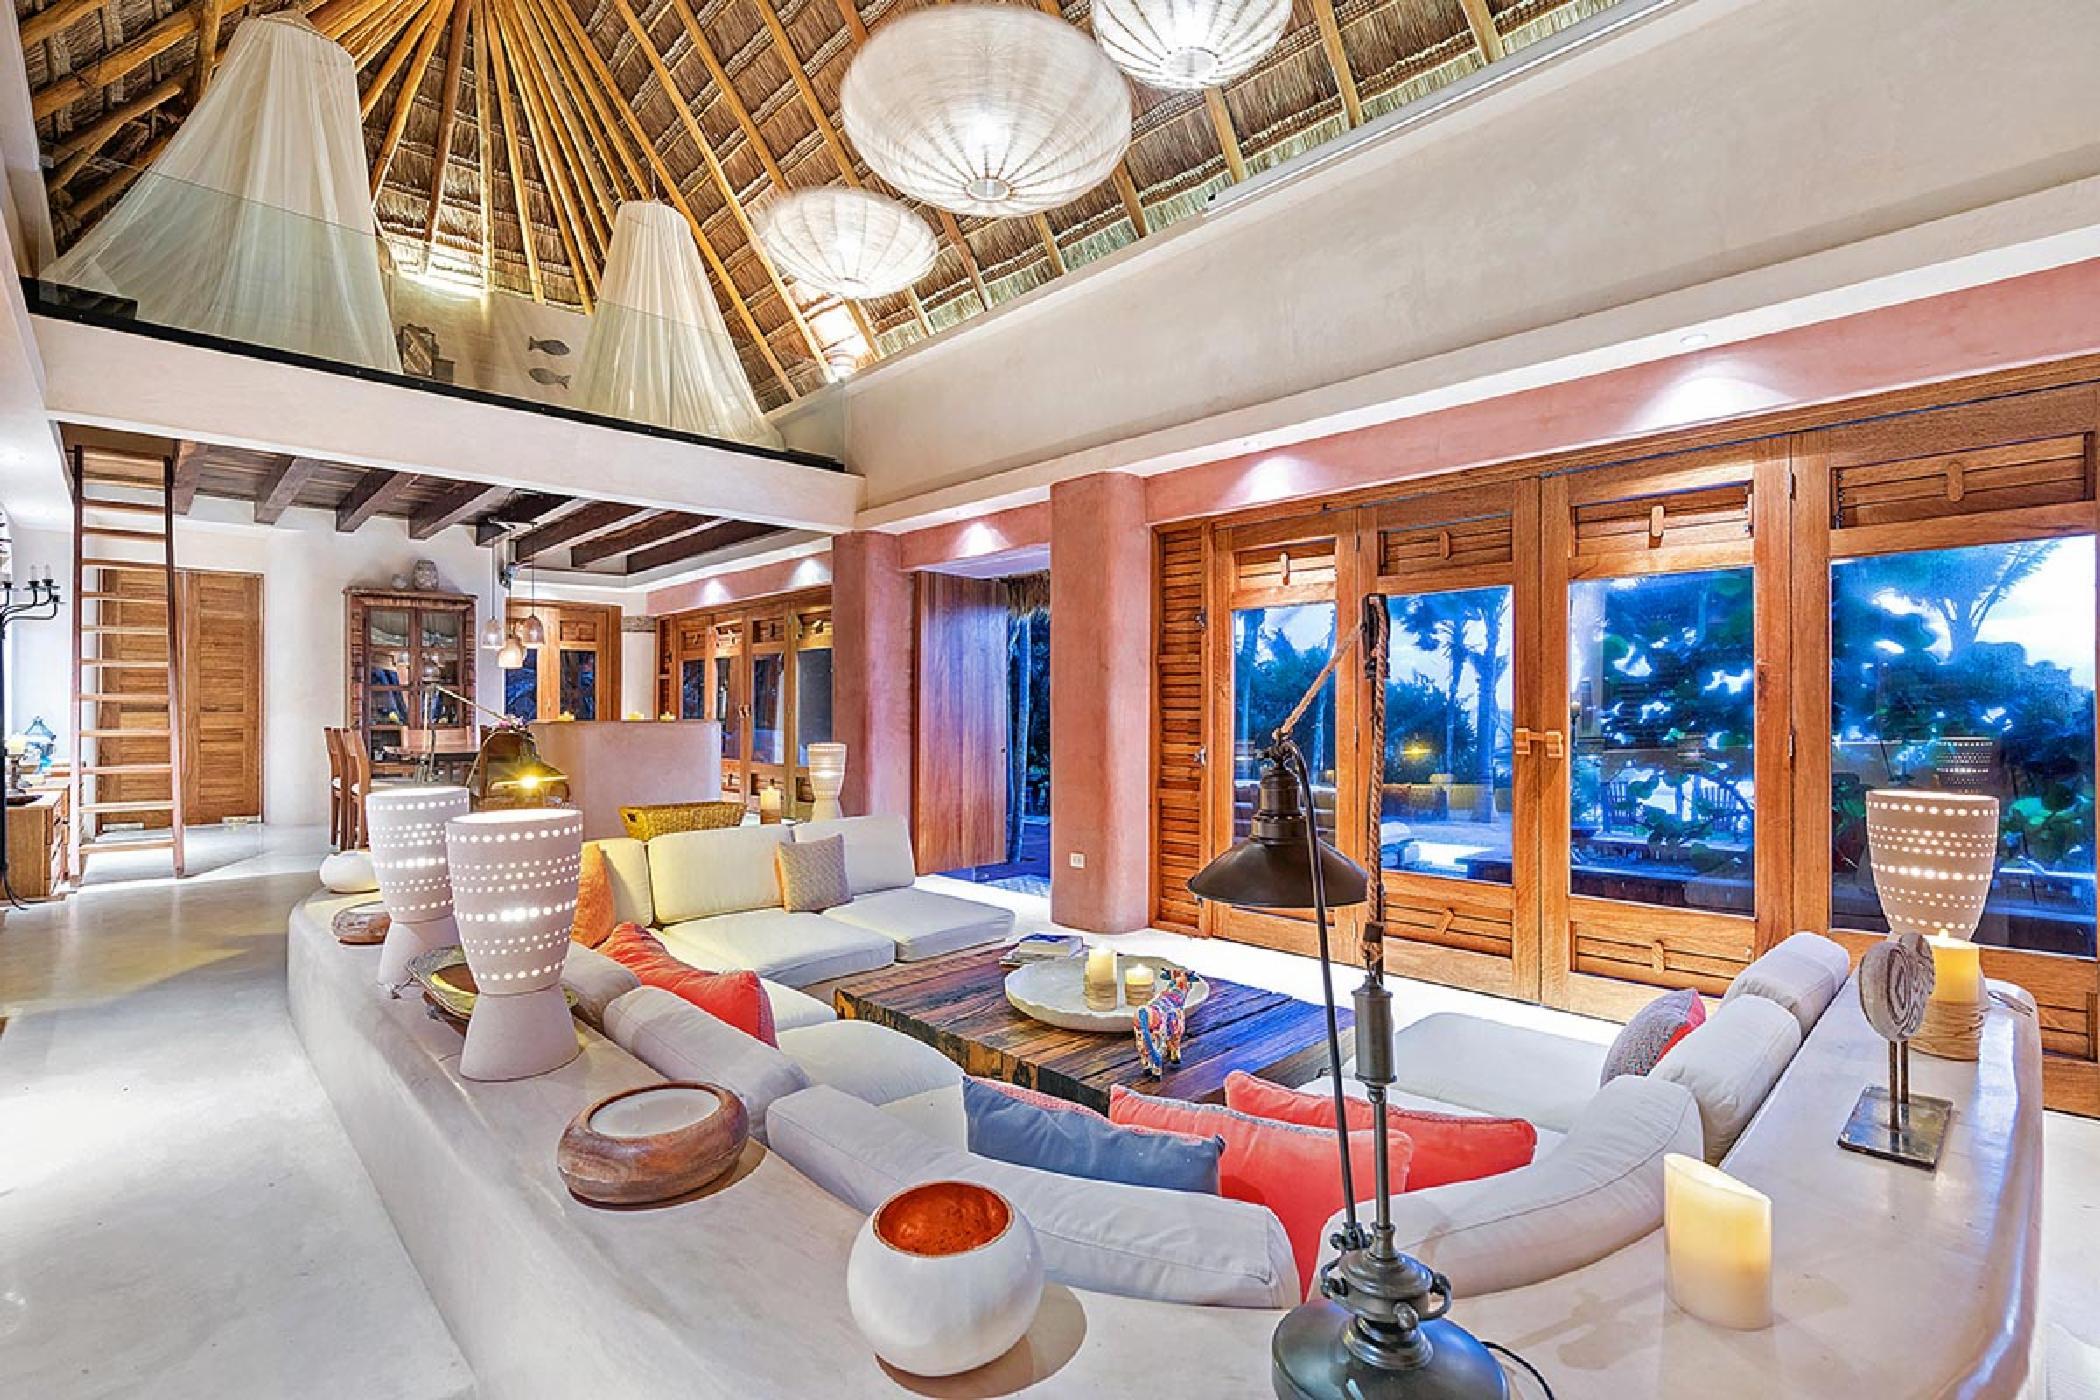 Maya_Luxe_Riviera_Maya_Luxury_Villas_Experiences_Sian_Kaan_Tulum_4_Bedrooms_Casa_Cantarena_15.jpg